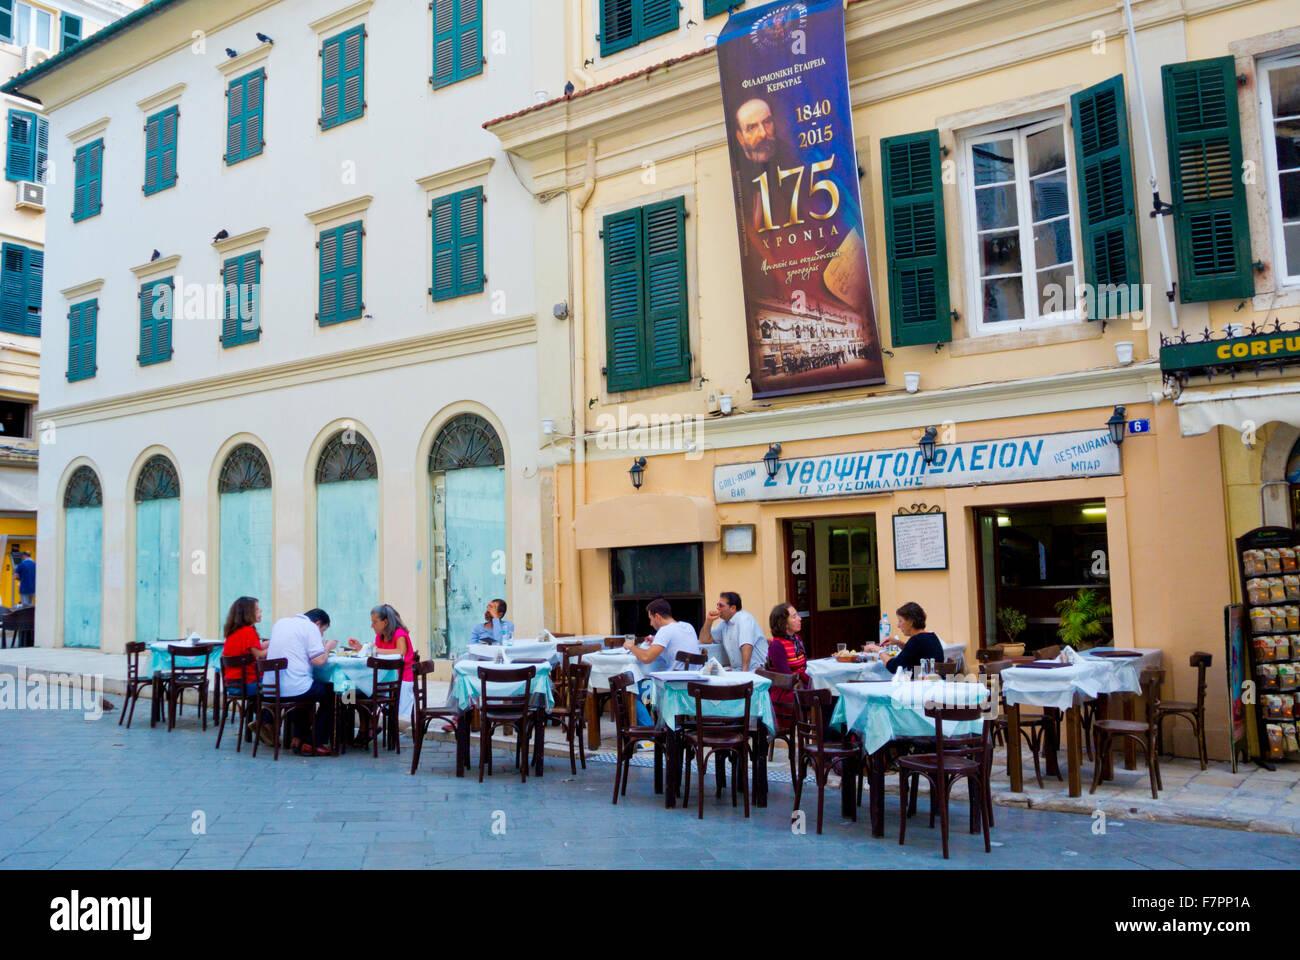 Restaurant, Nikiforou Theotoki street, Old town, Corfu, Ionian islands, Greece - Stock Image